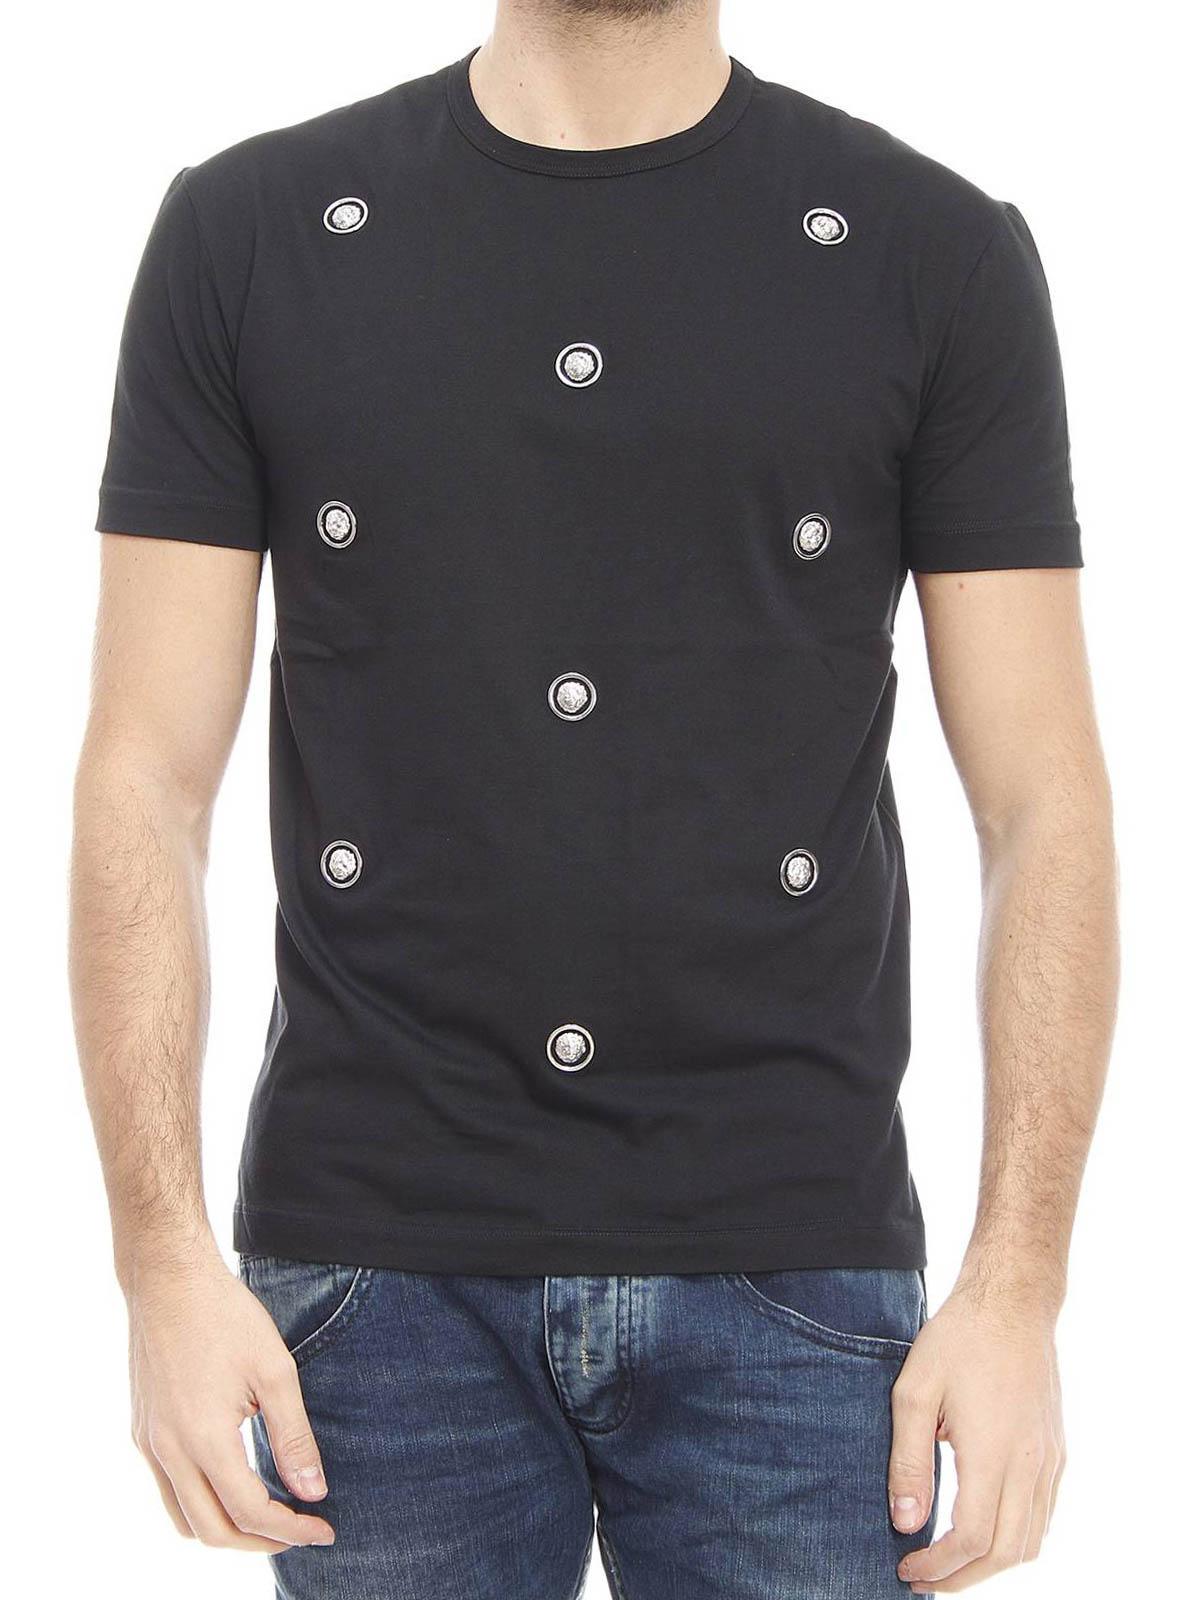 14f9bc8cc Versus Versace - Lion Head studded T-shirt - t-shirts - BU90232 ...